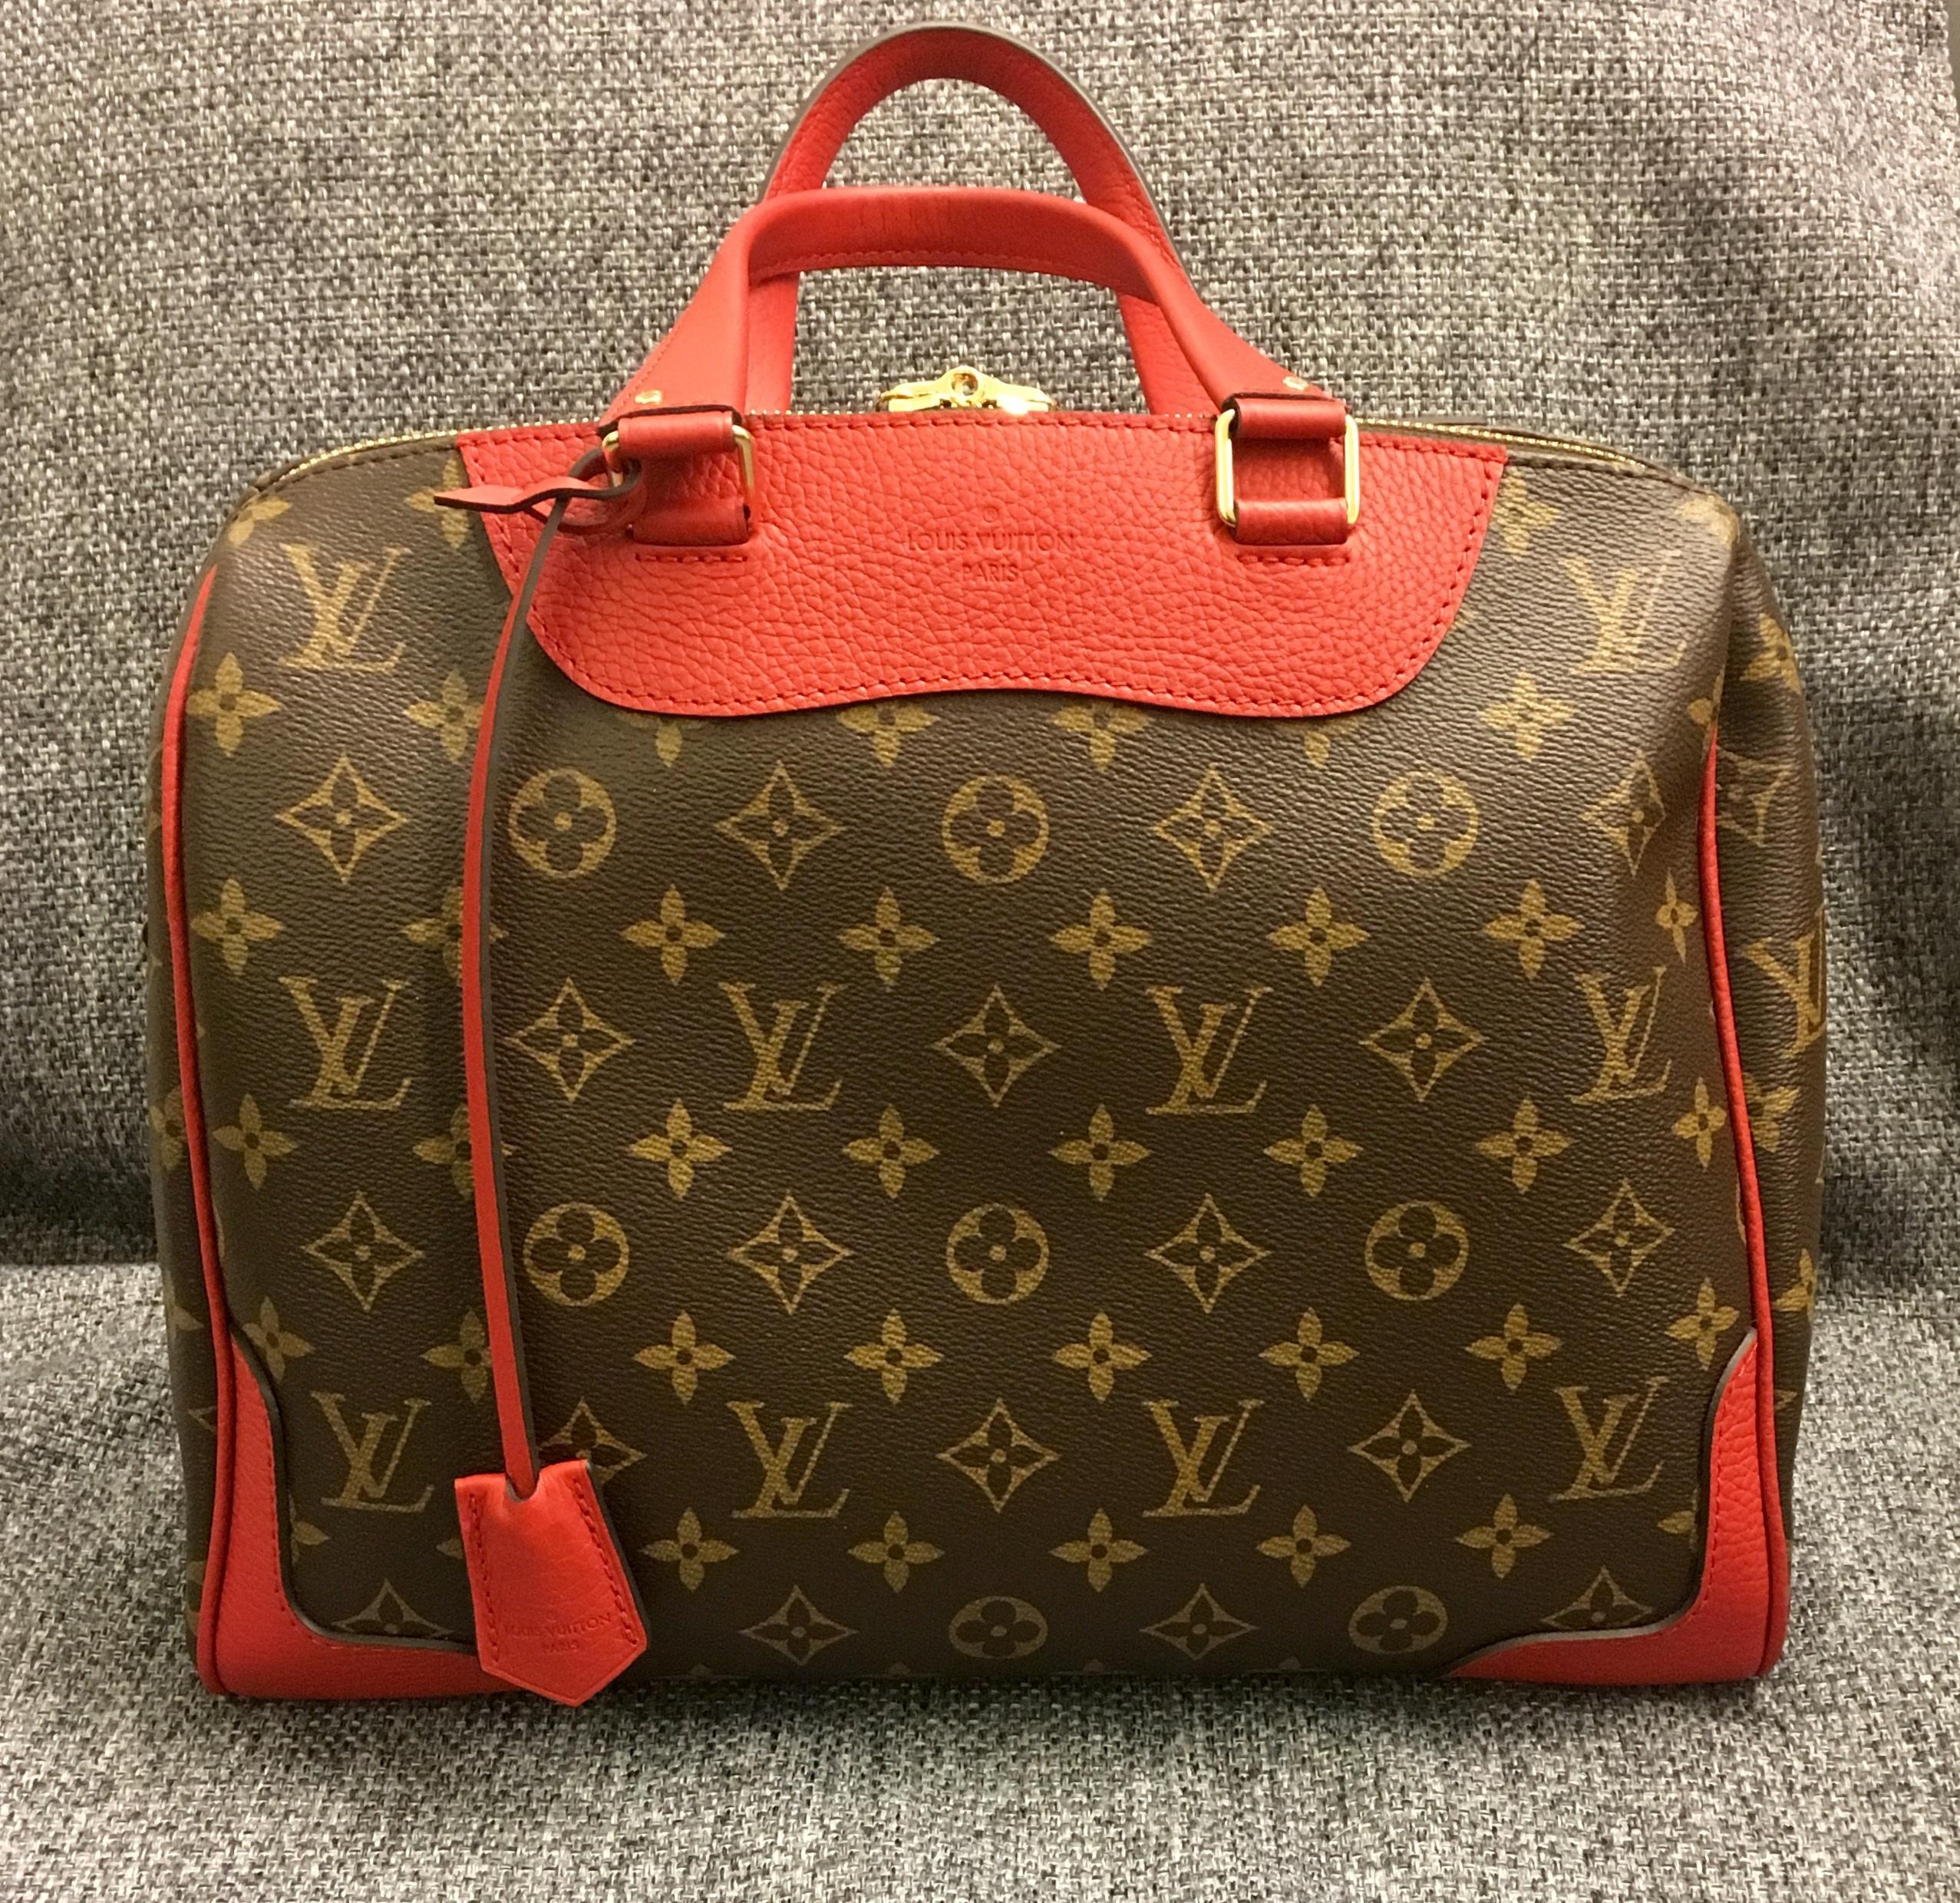 Free leather pattern red handbag brand baggage